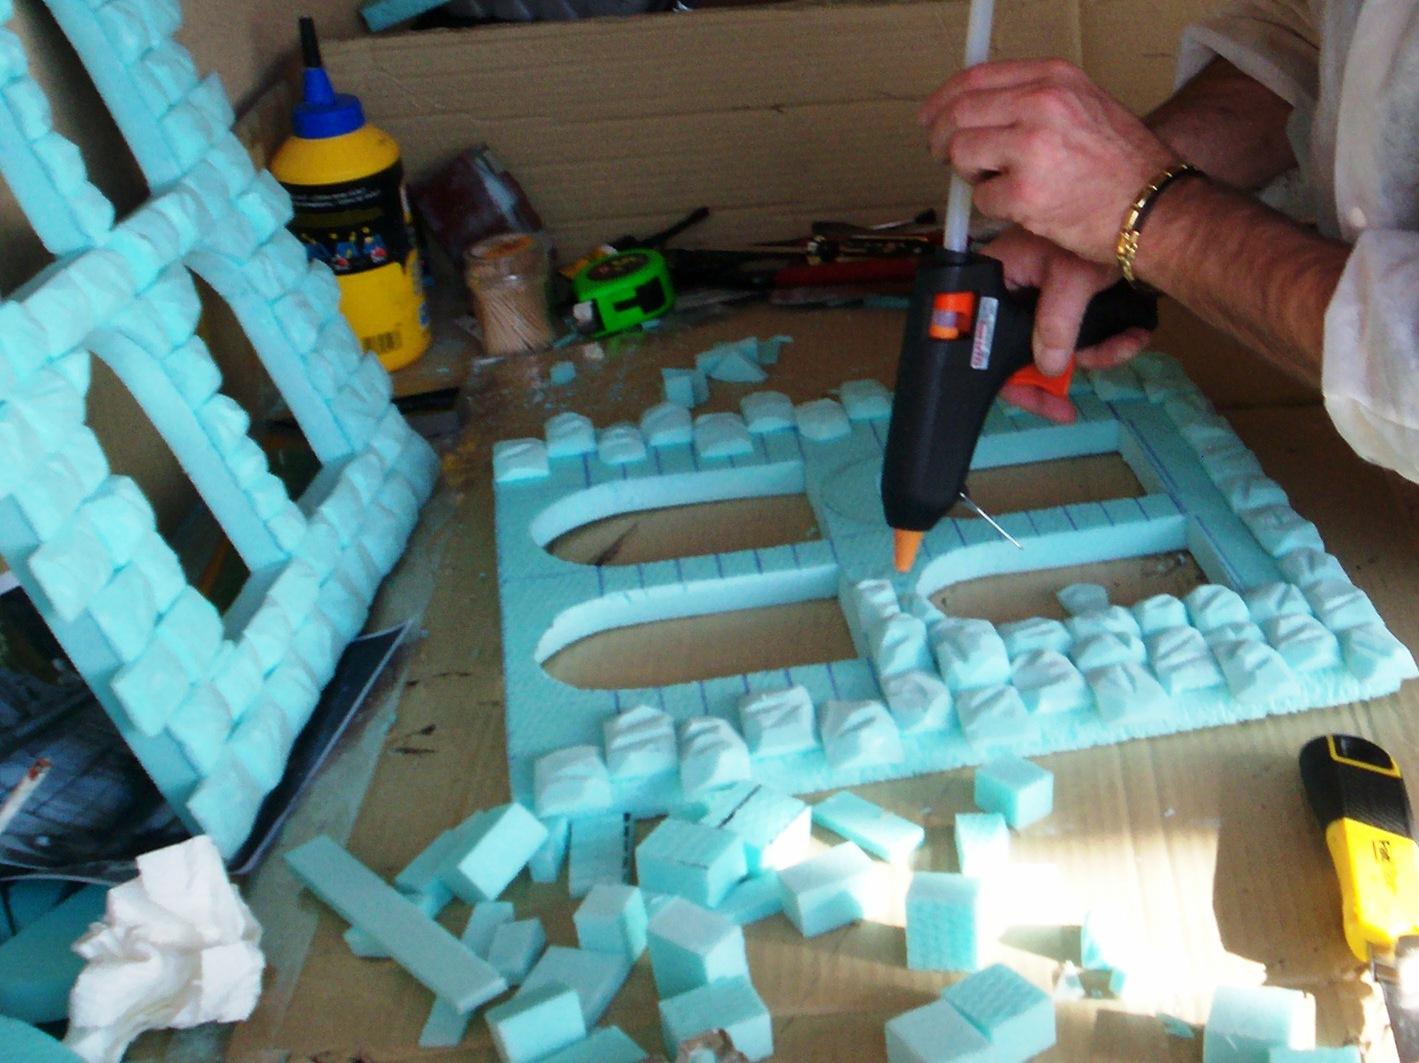 Strutture e architetture presepir - Costruire case in pietra ...